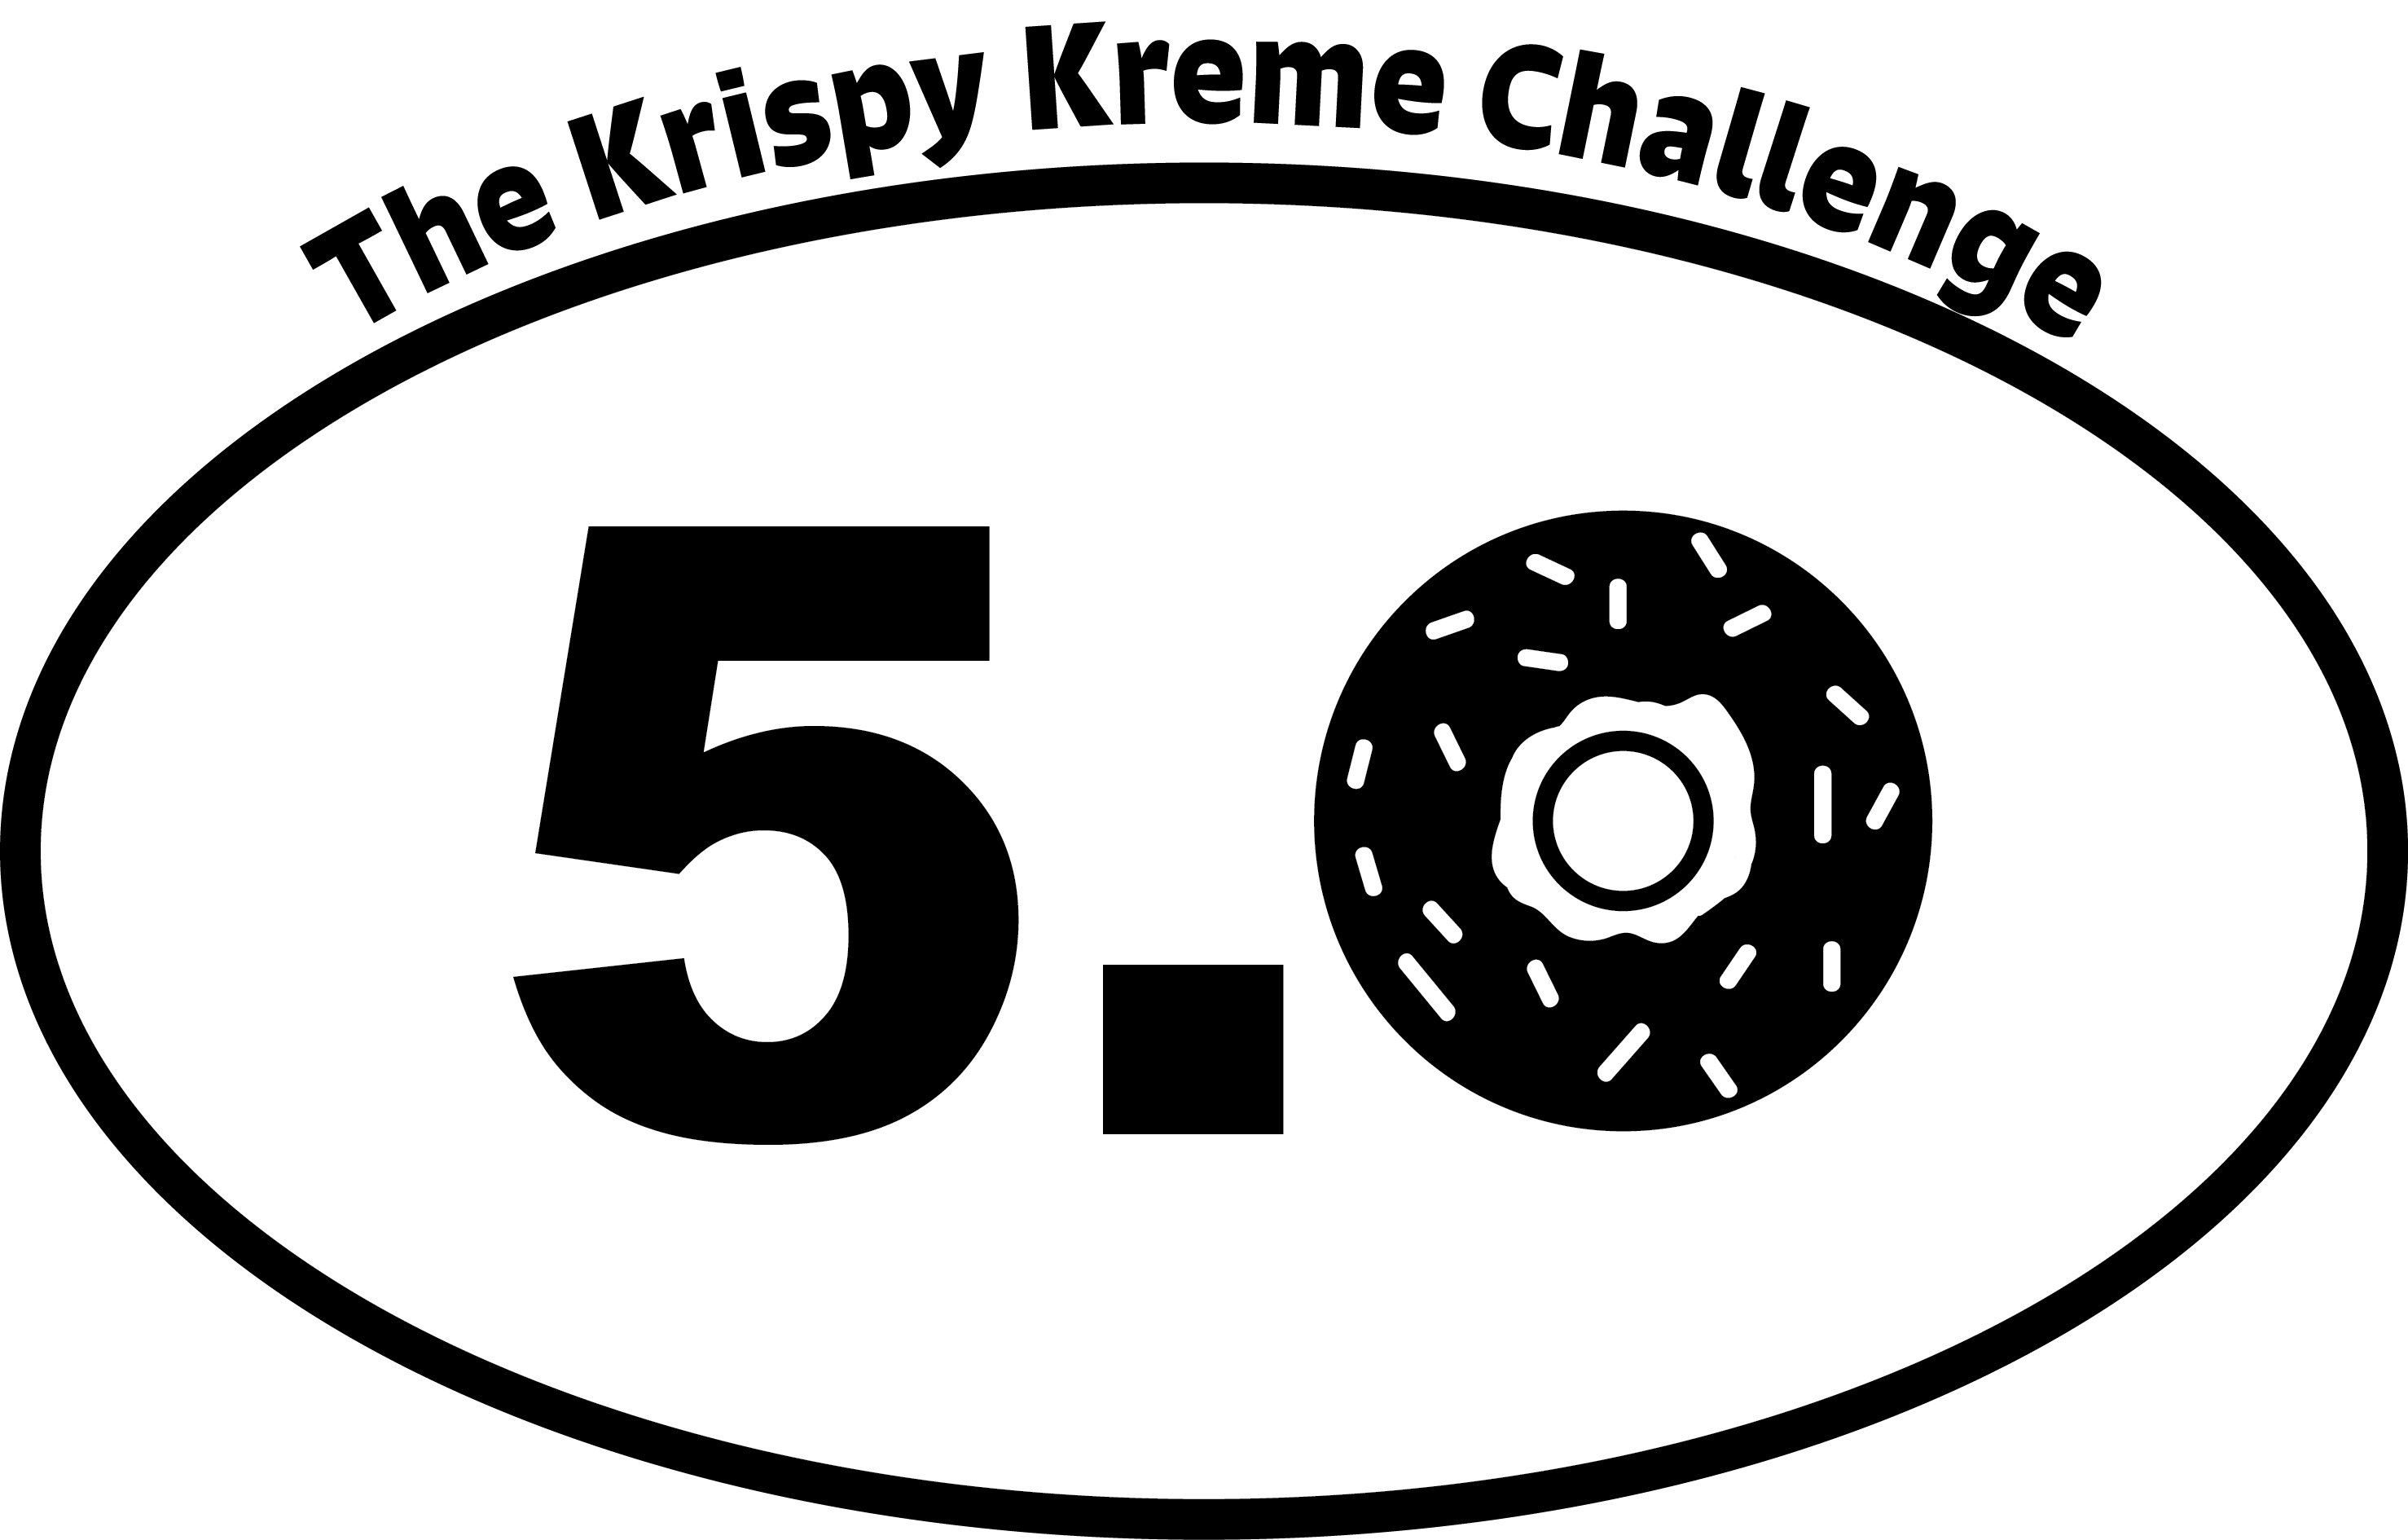 krispy-kreme-challenge-sponsor